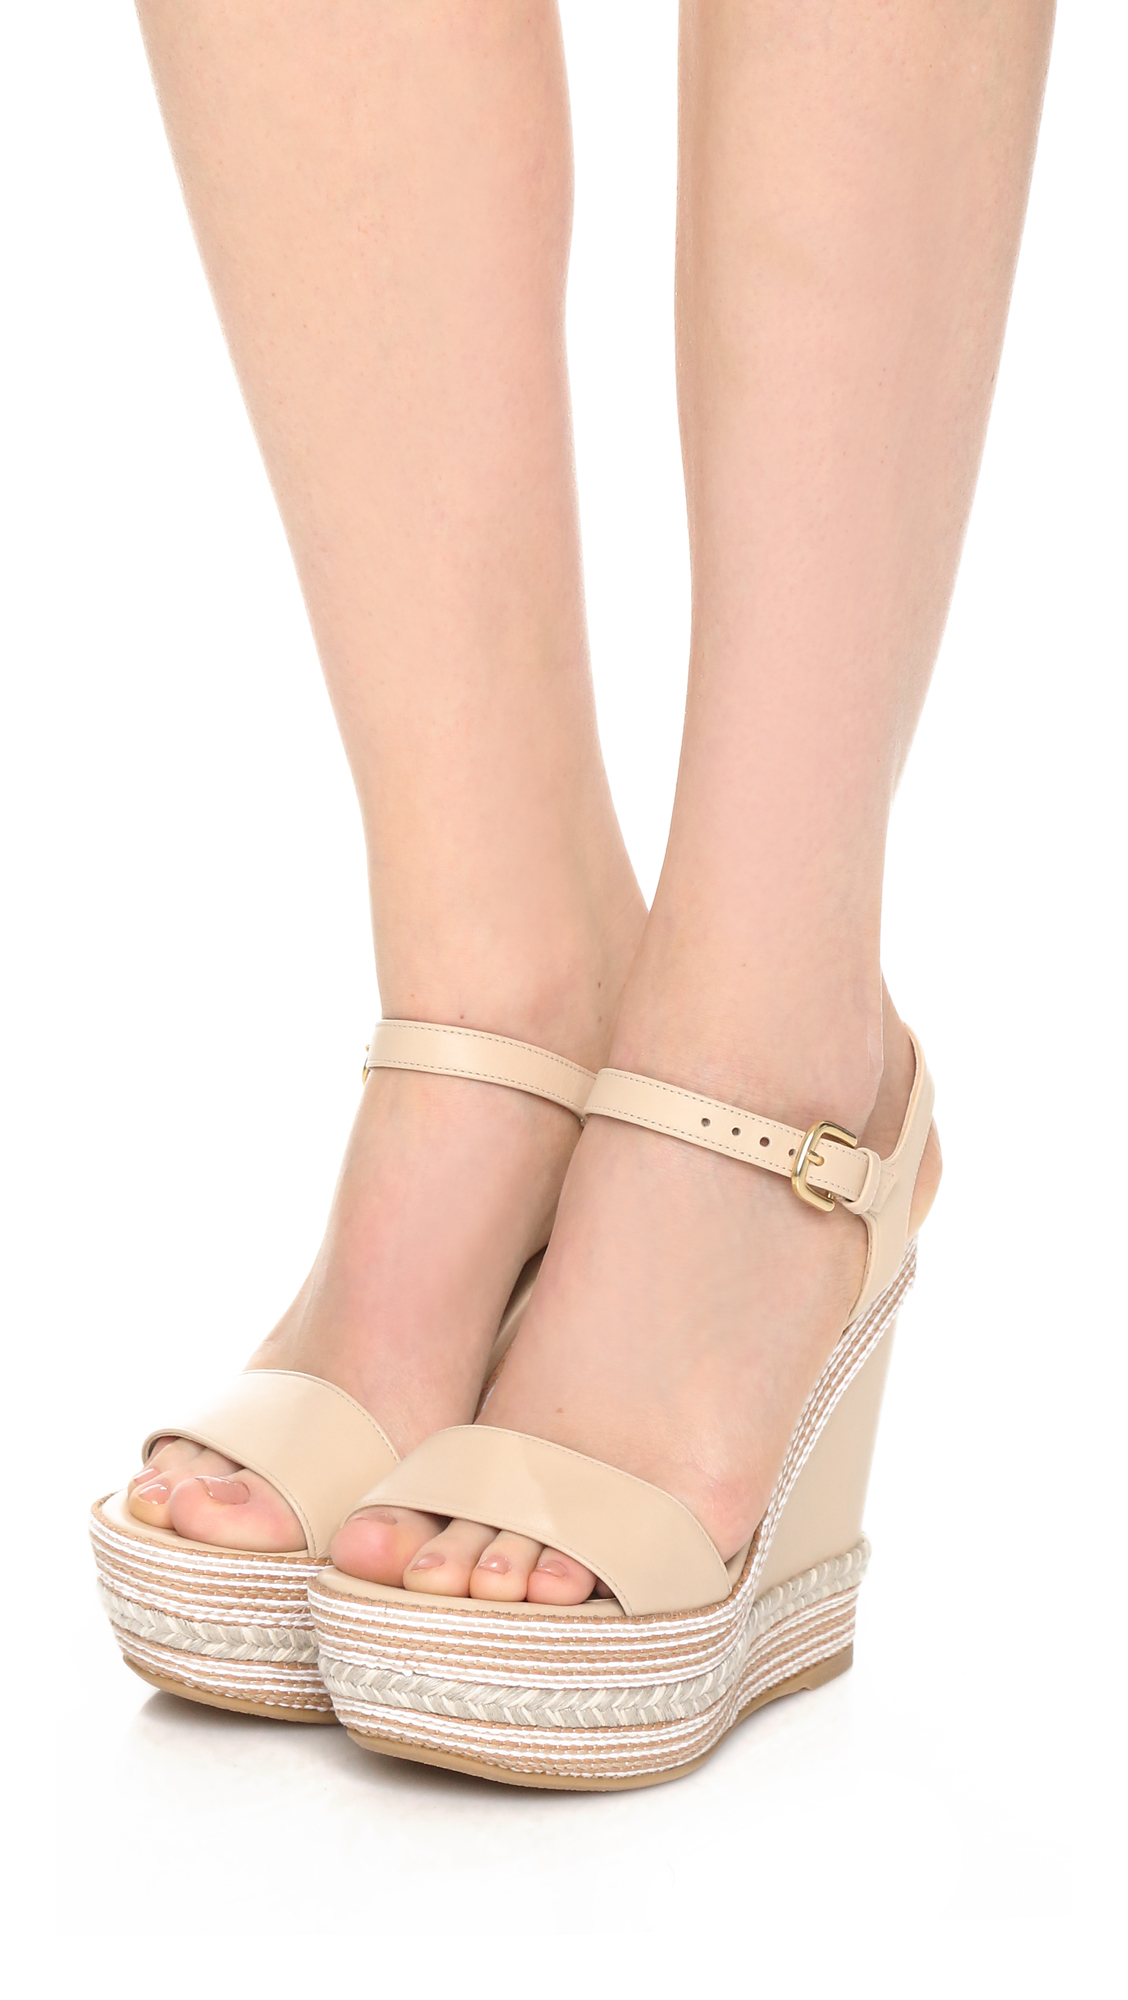 stuart weitzman single wedge sandals in lyst